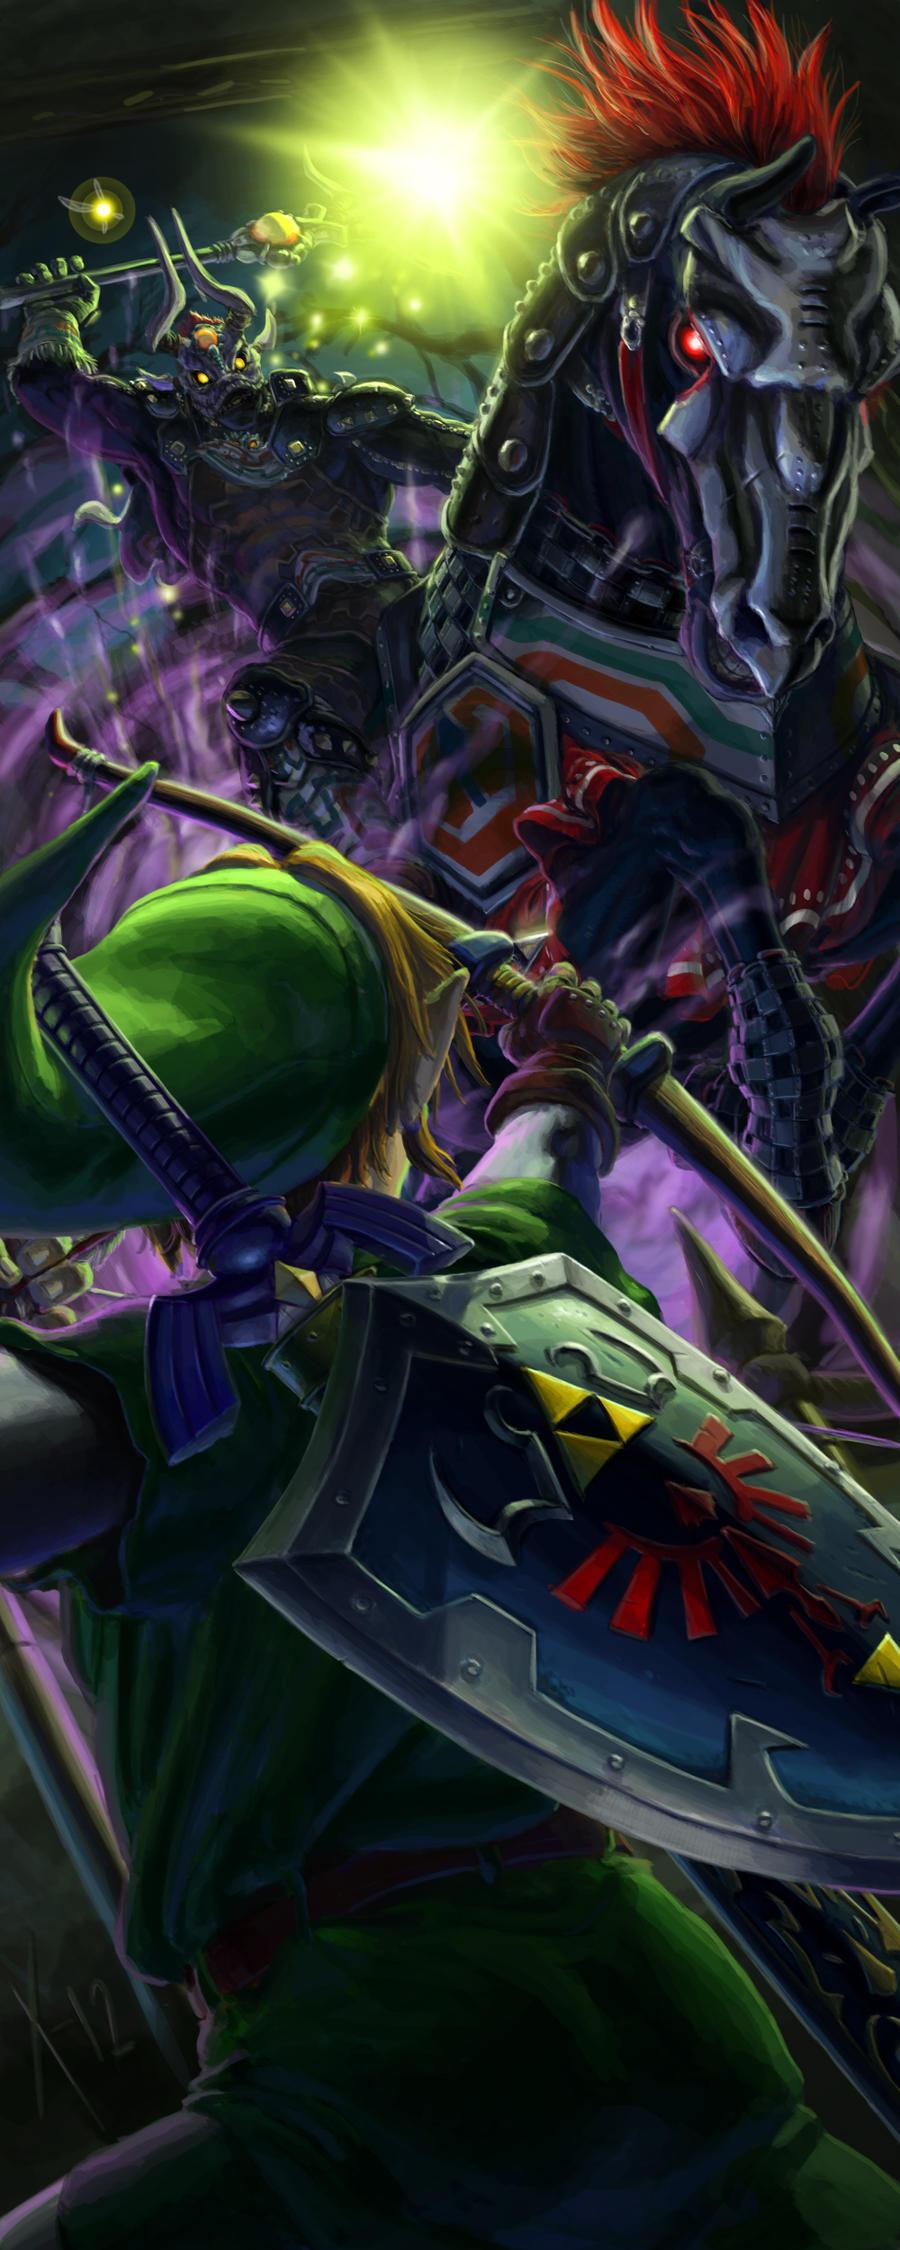 Link vs Phantom Ganon by Txikimorin